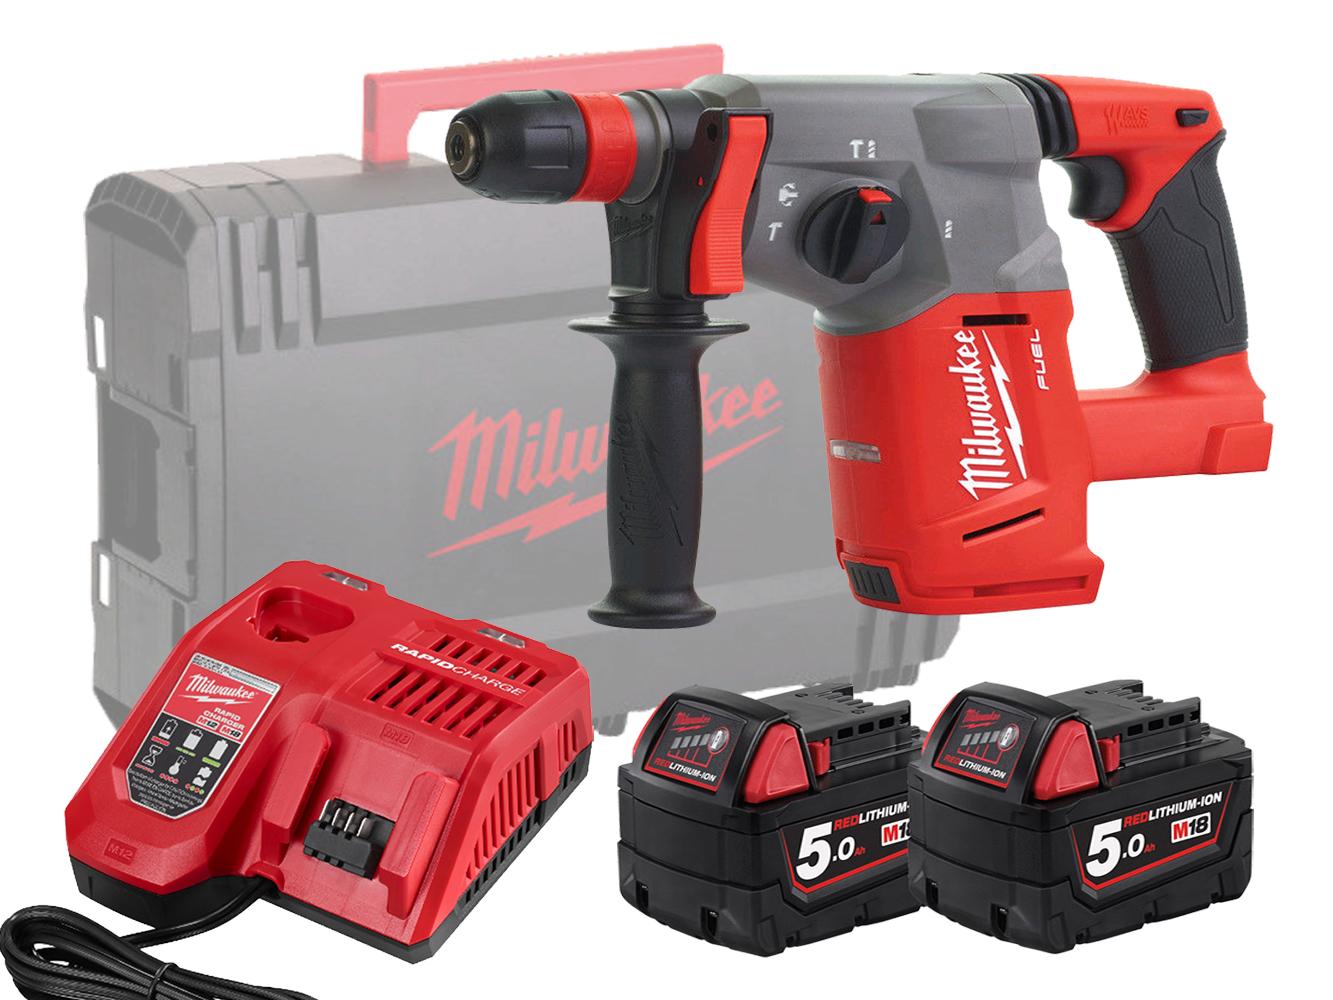 Milwaukee M18CHX 18V Fuel Brushless SDS+ 3-Mode Hammer Drill - 5.0Ah Pack